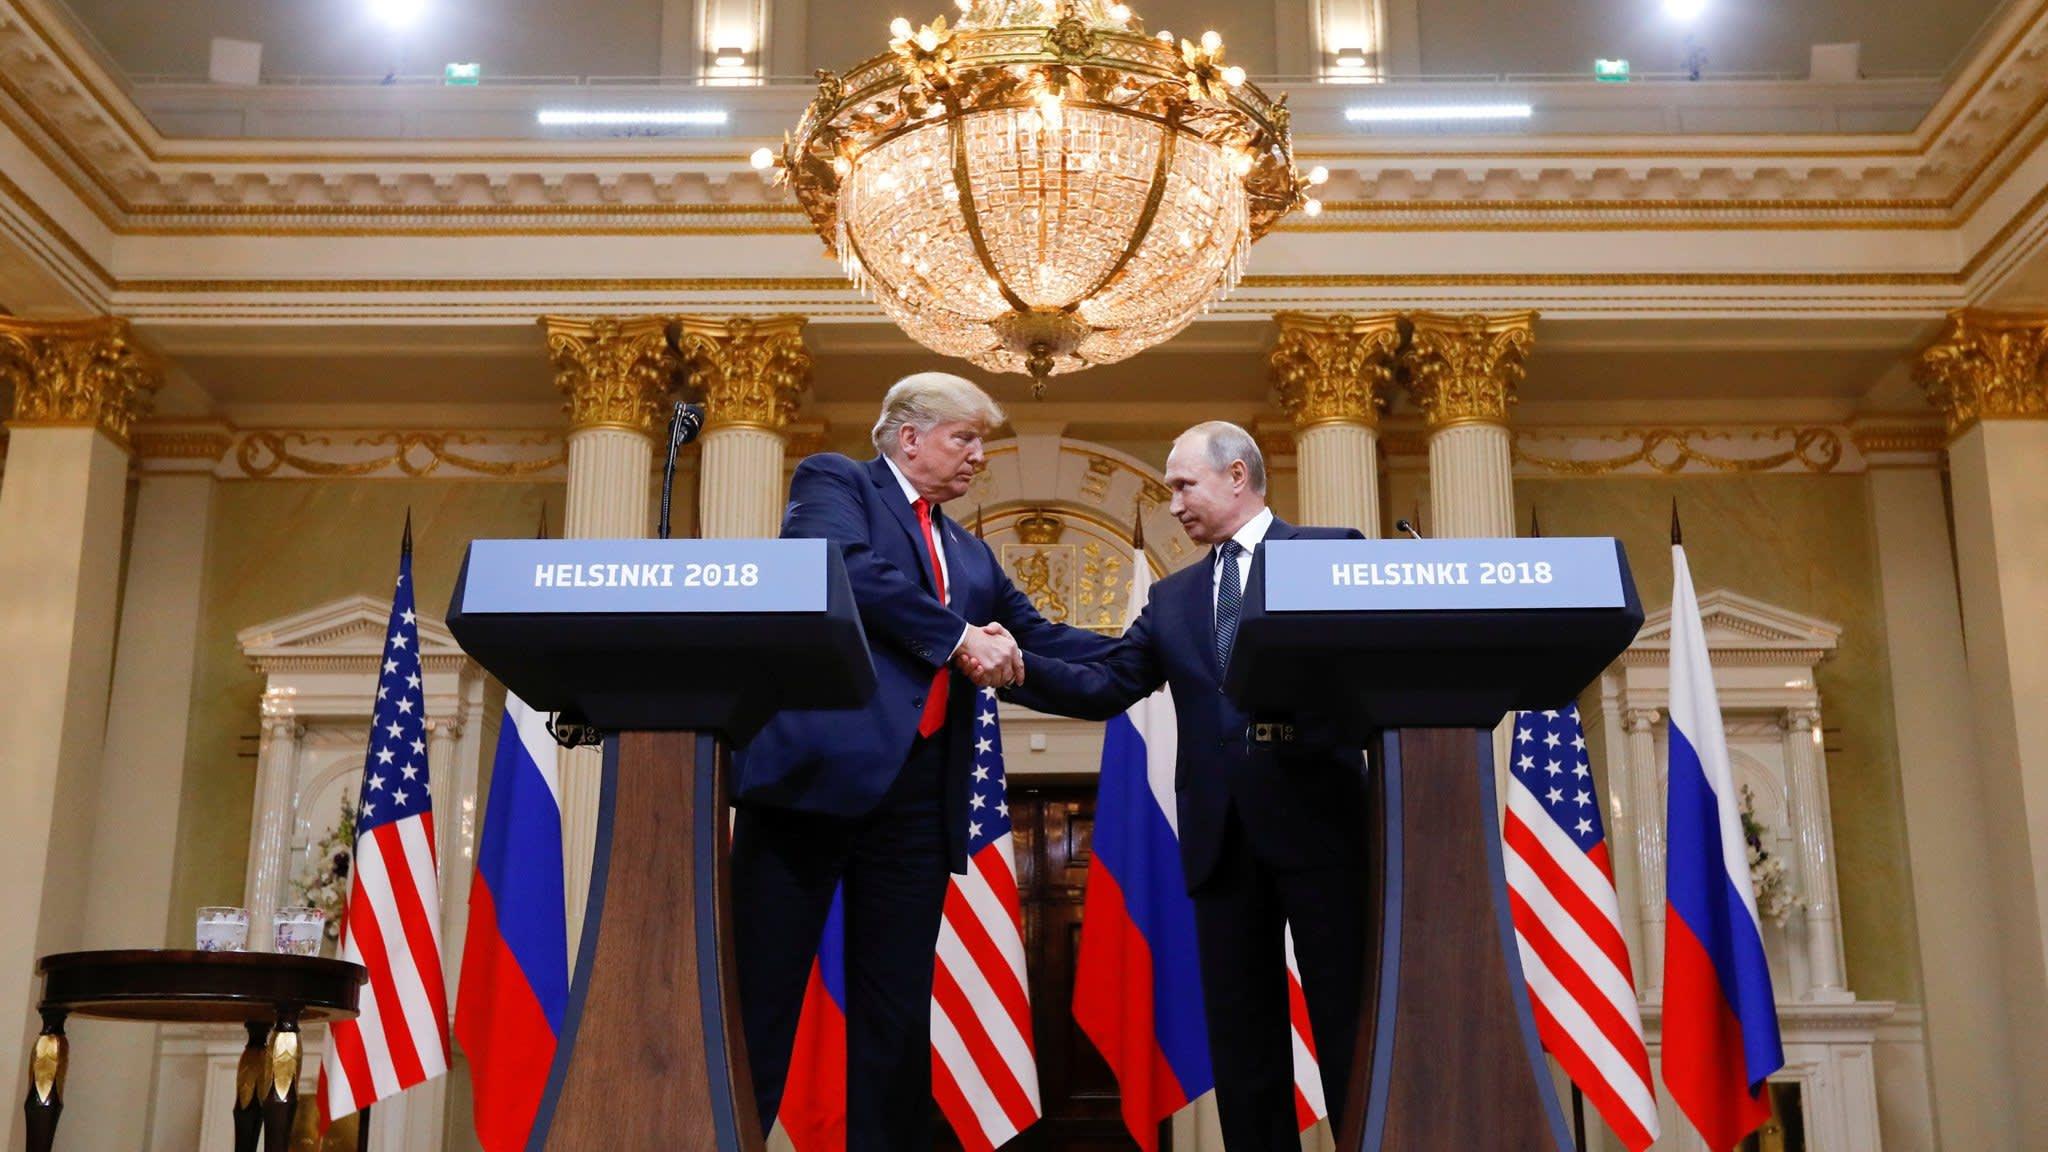 Republicans reproach Trump for defending Putin